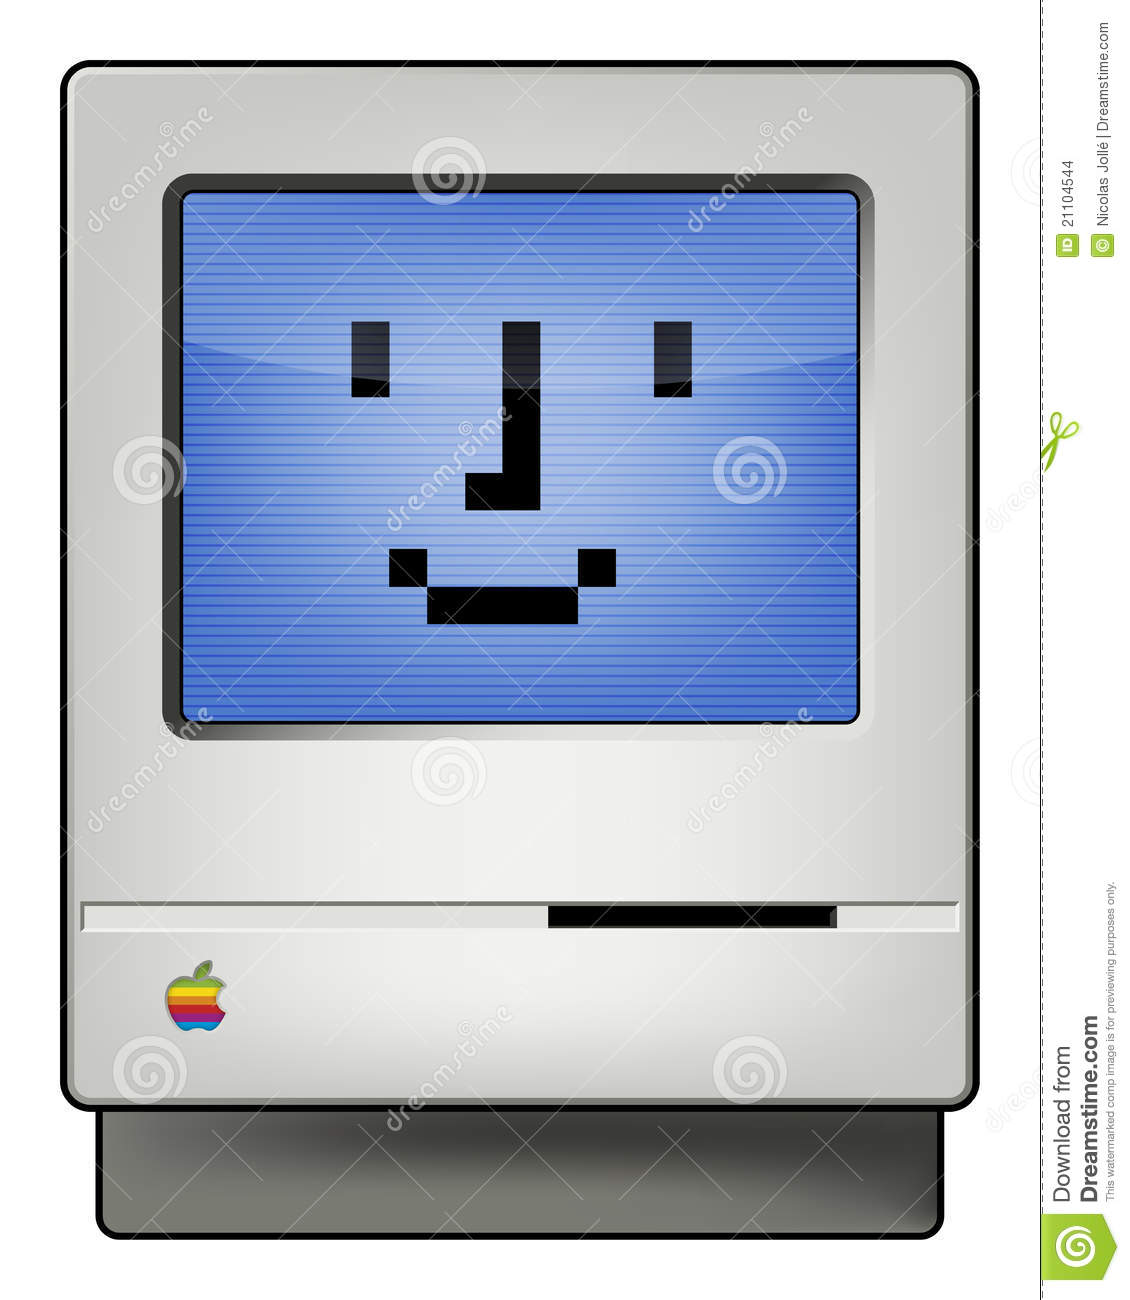 Macintosh Clipart.